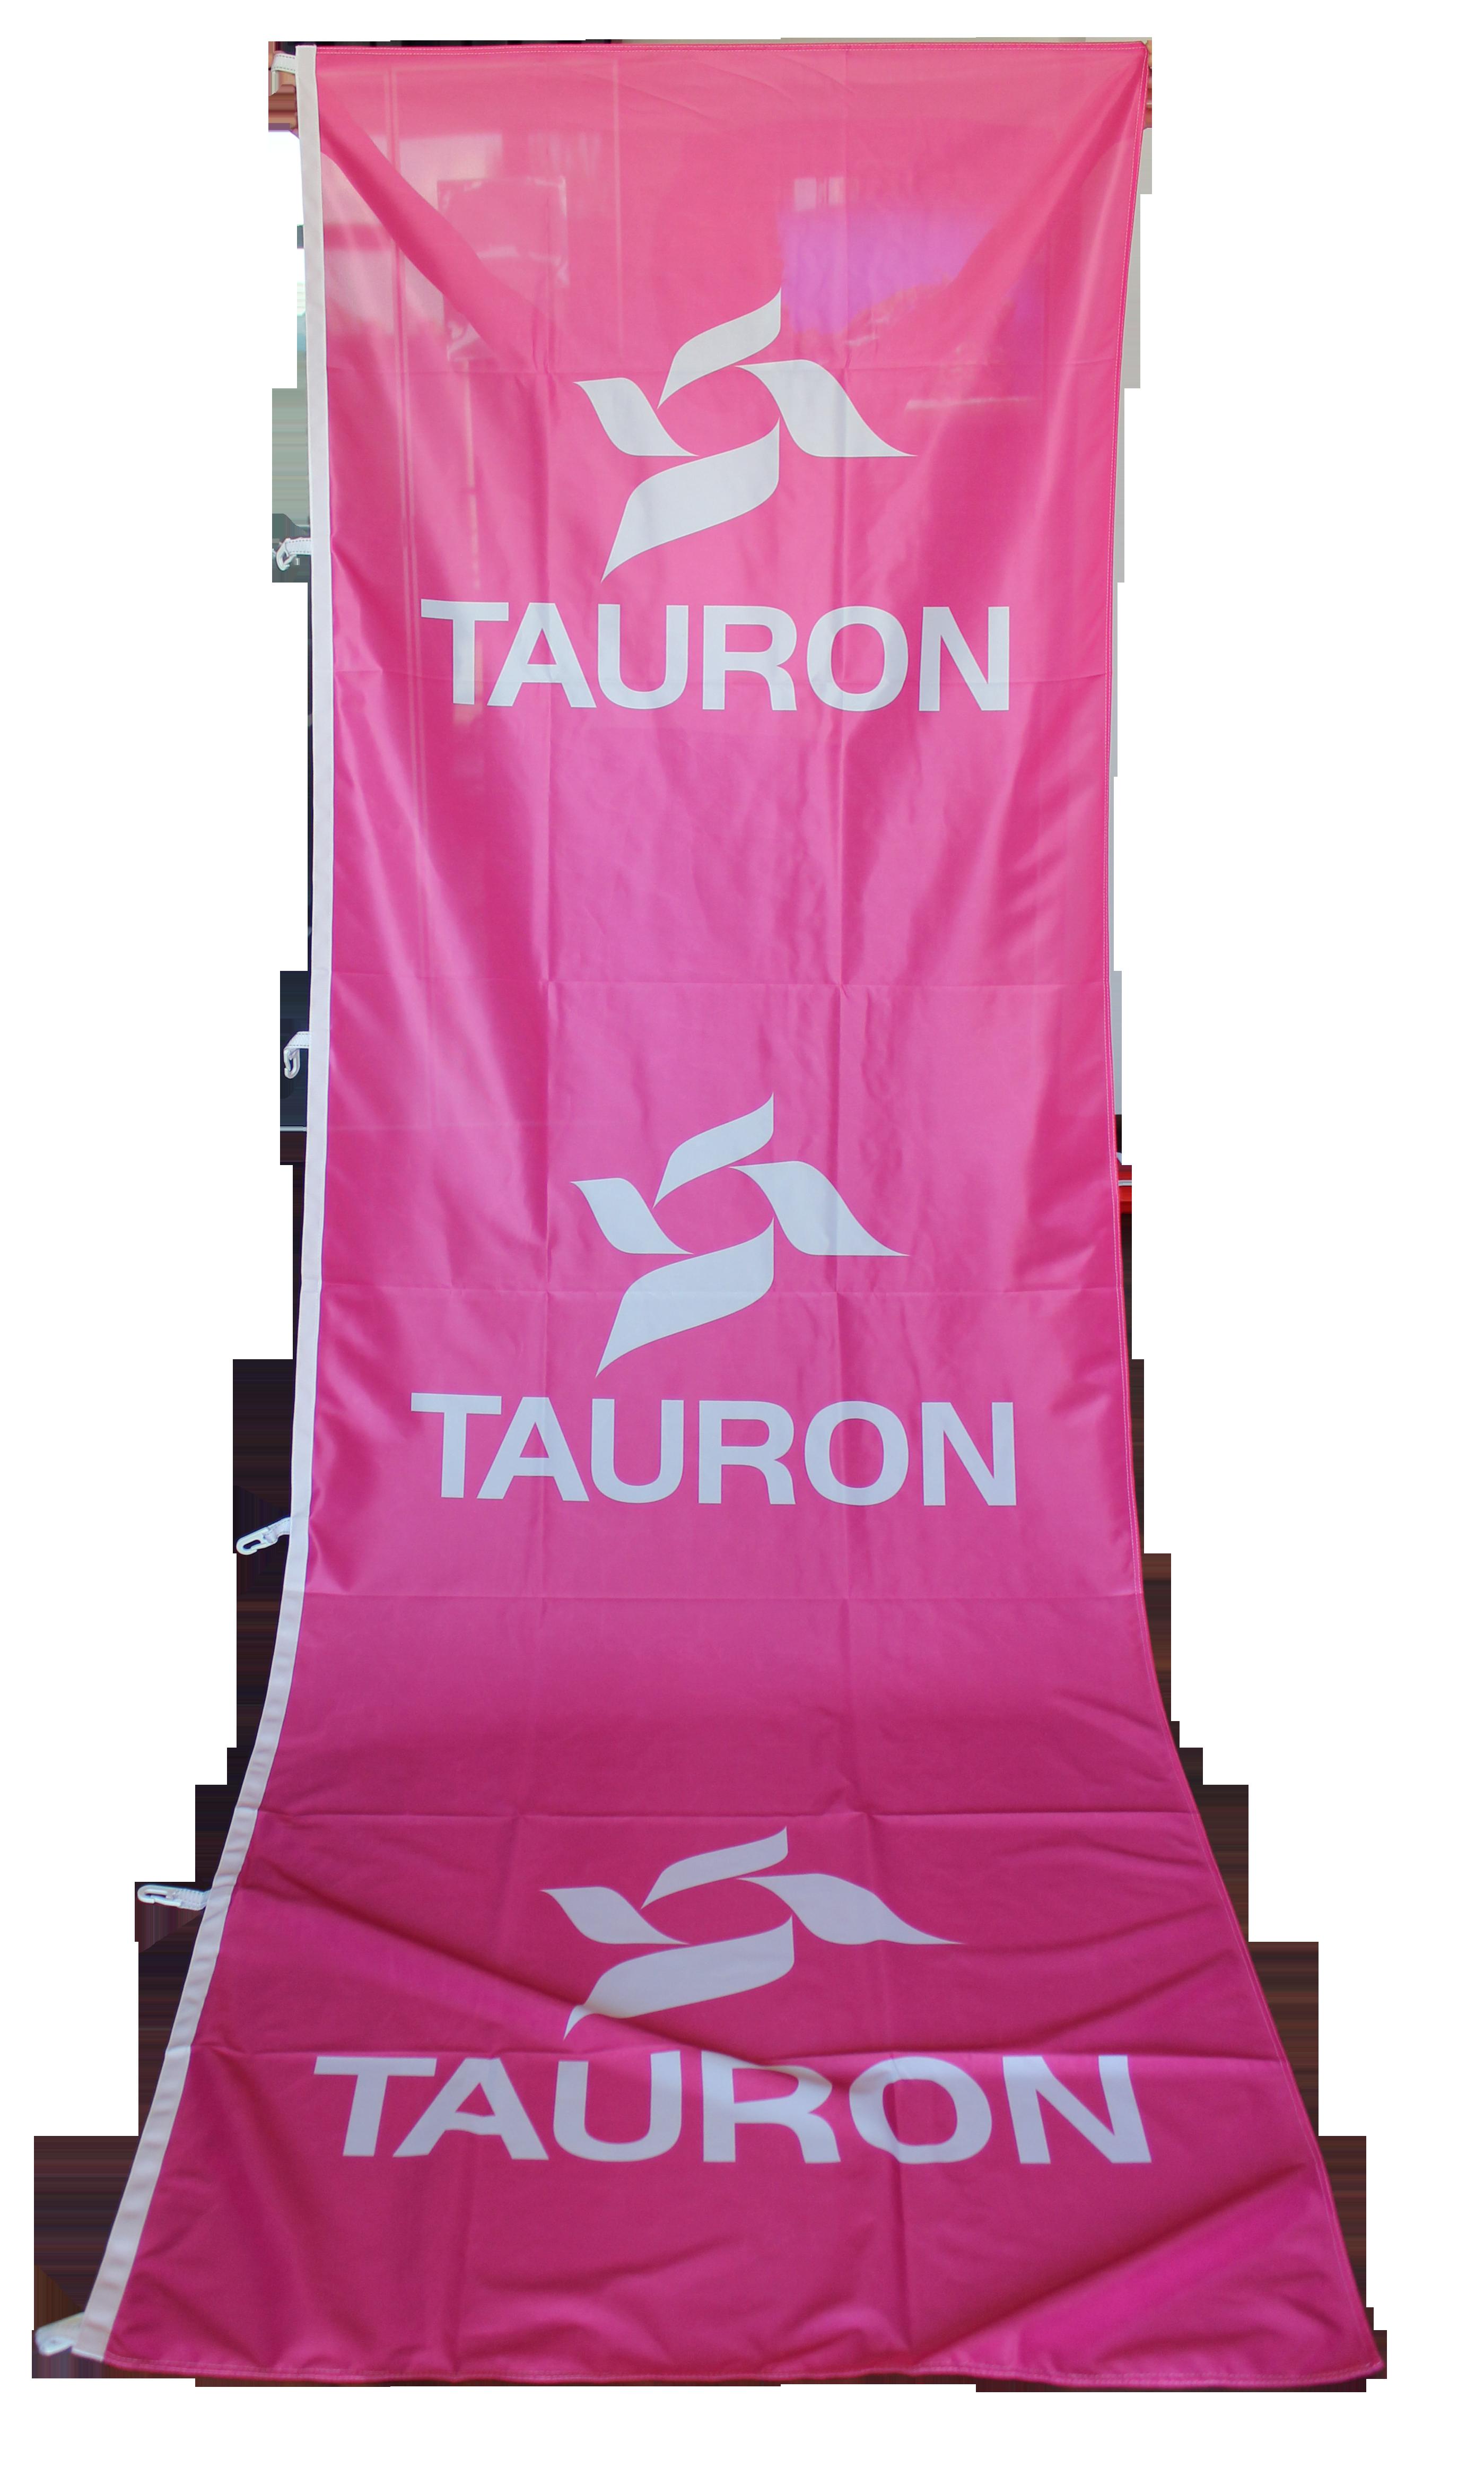 flagi reklamowe tauron